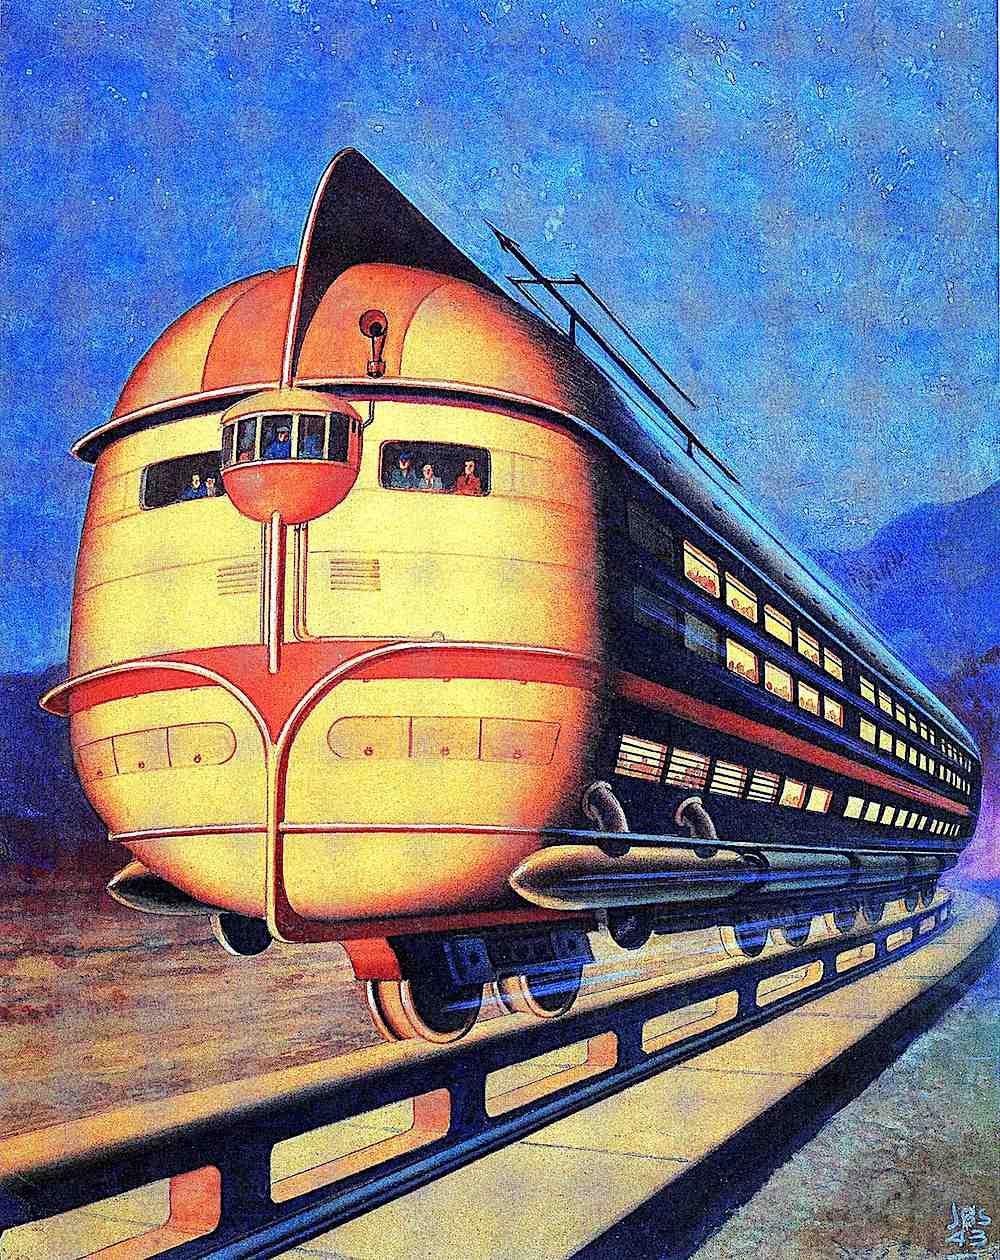 a 1943 future giant monorail, retrofuture